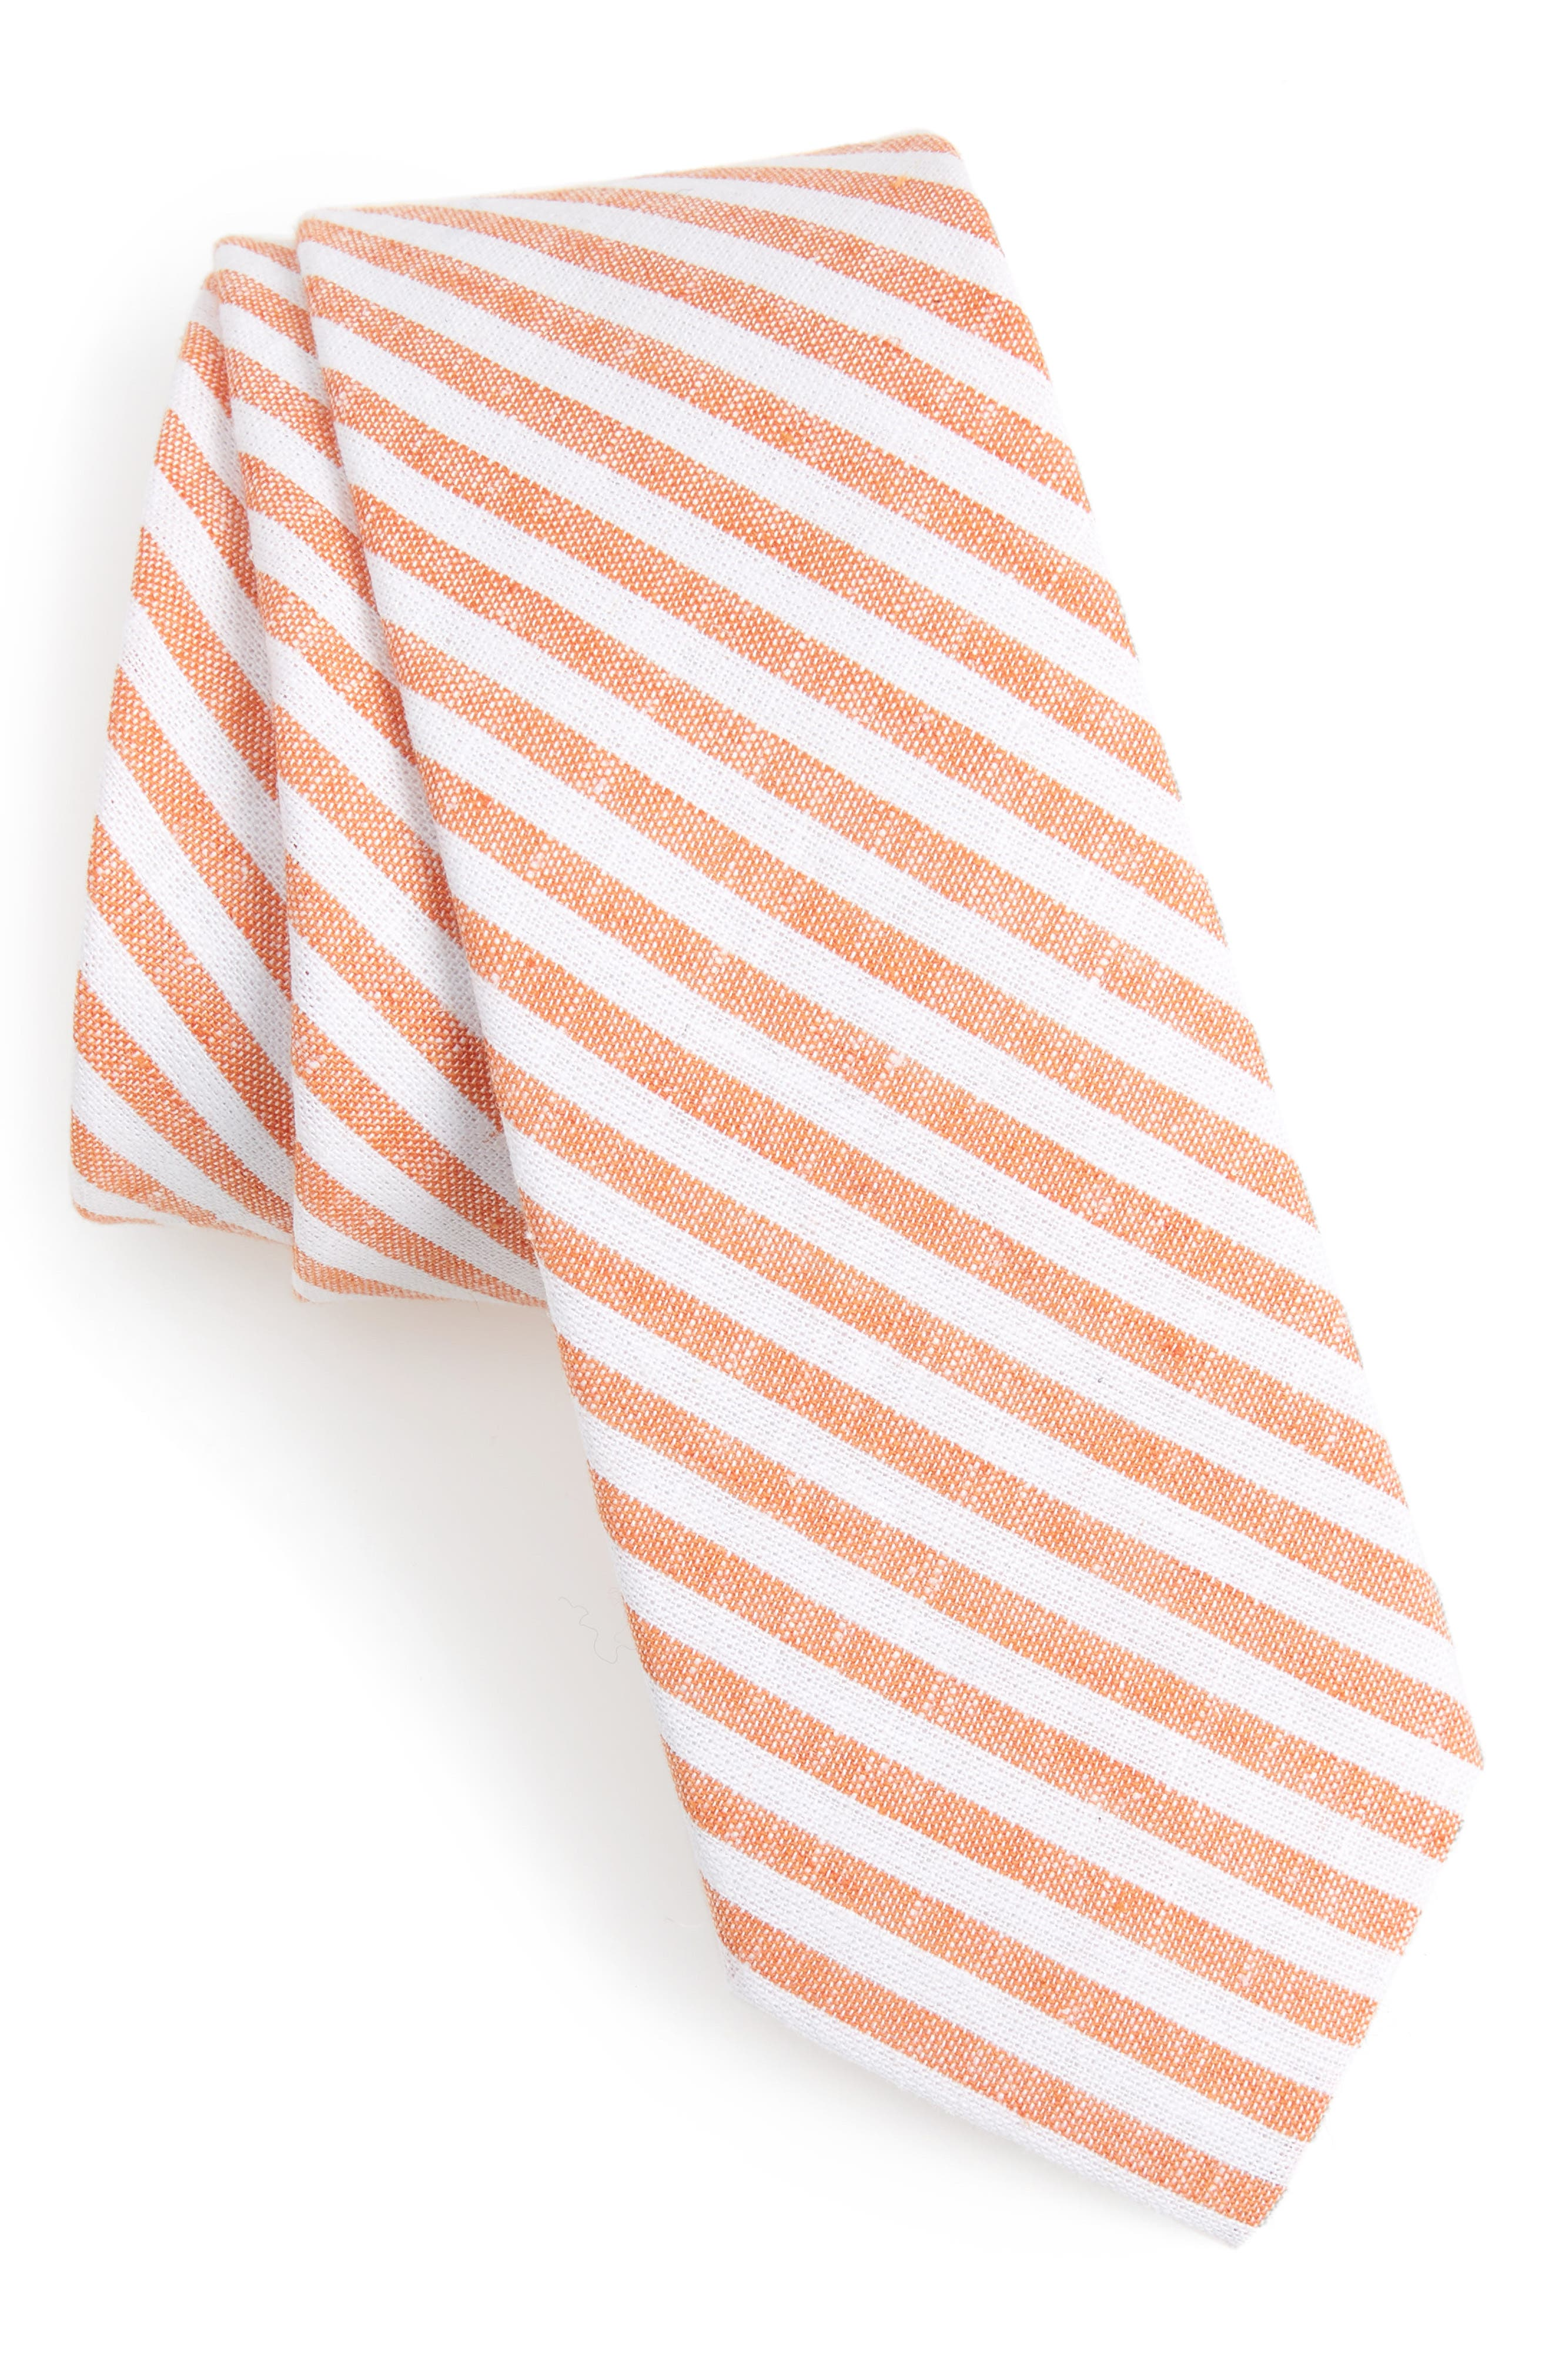 Telary Stripe Cotton Skinny Tie,                         Main,                         color, Orange